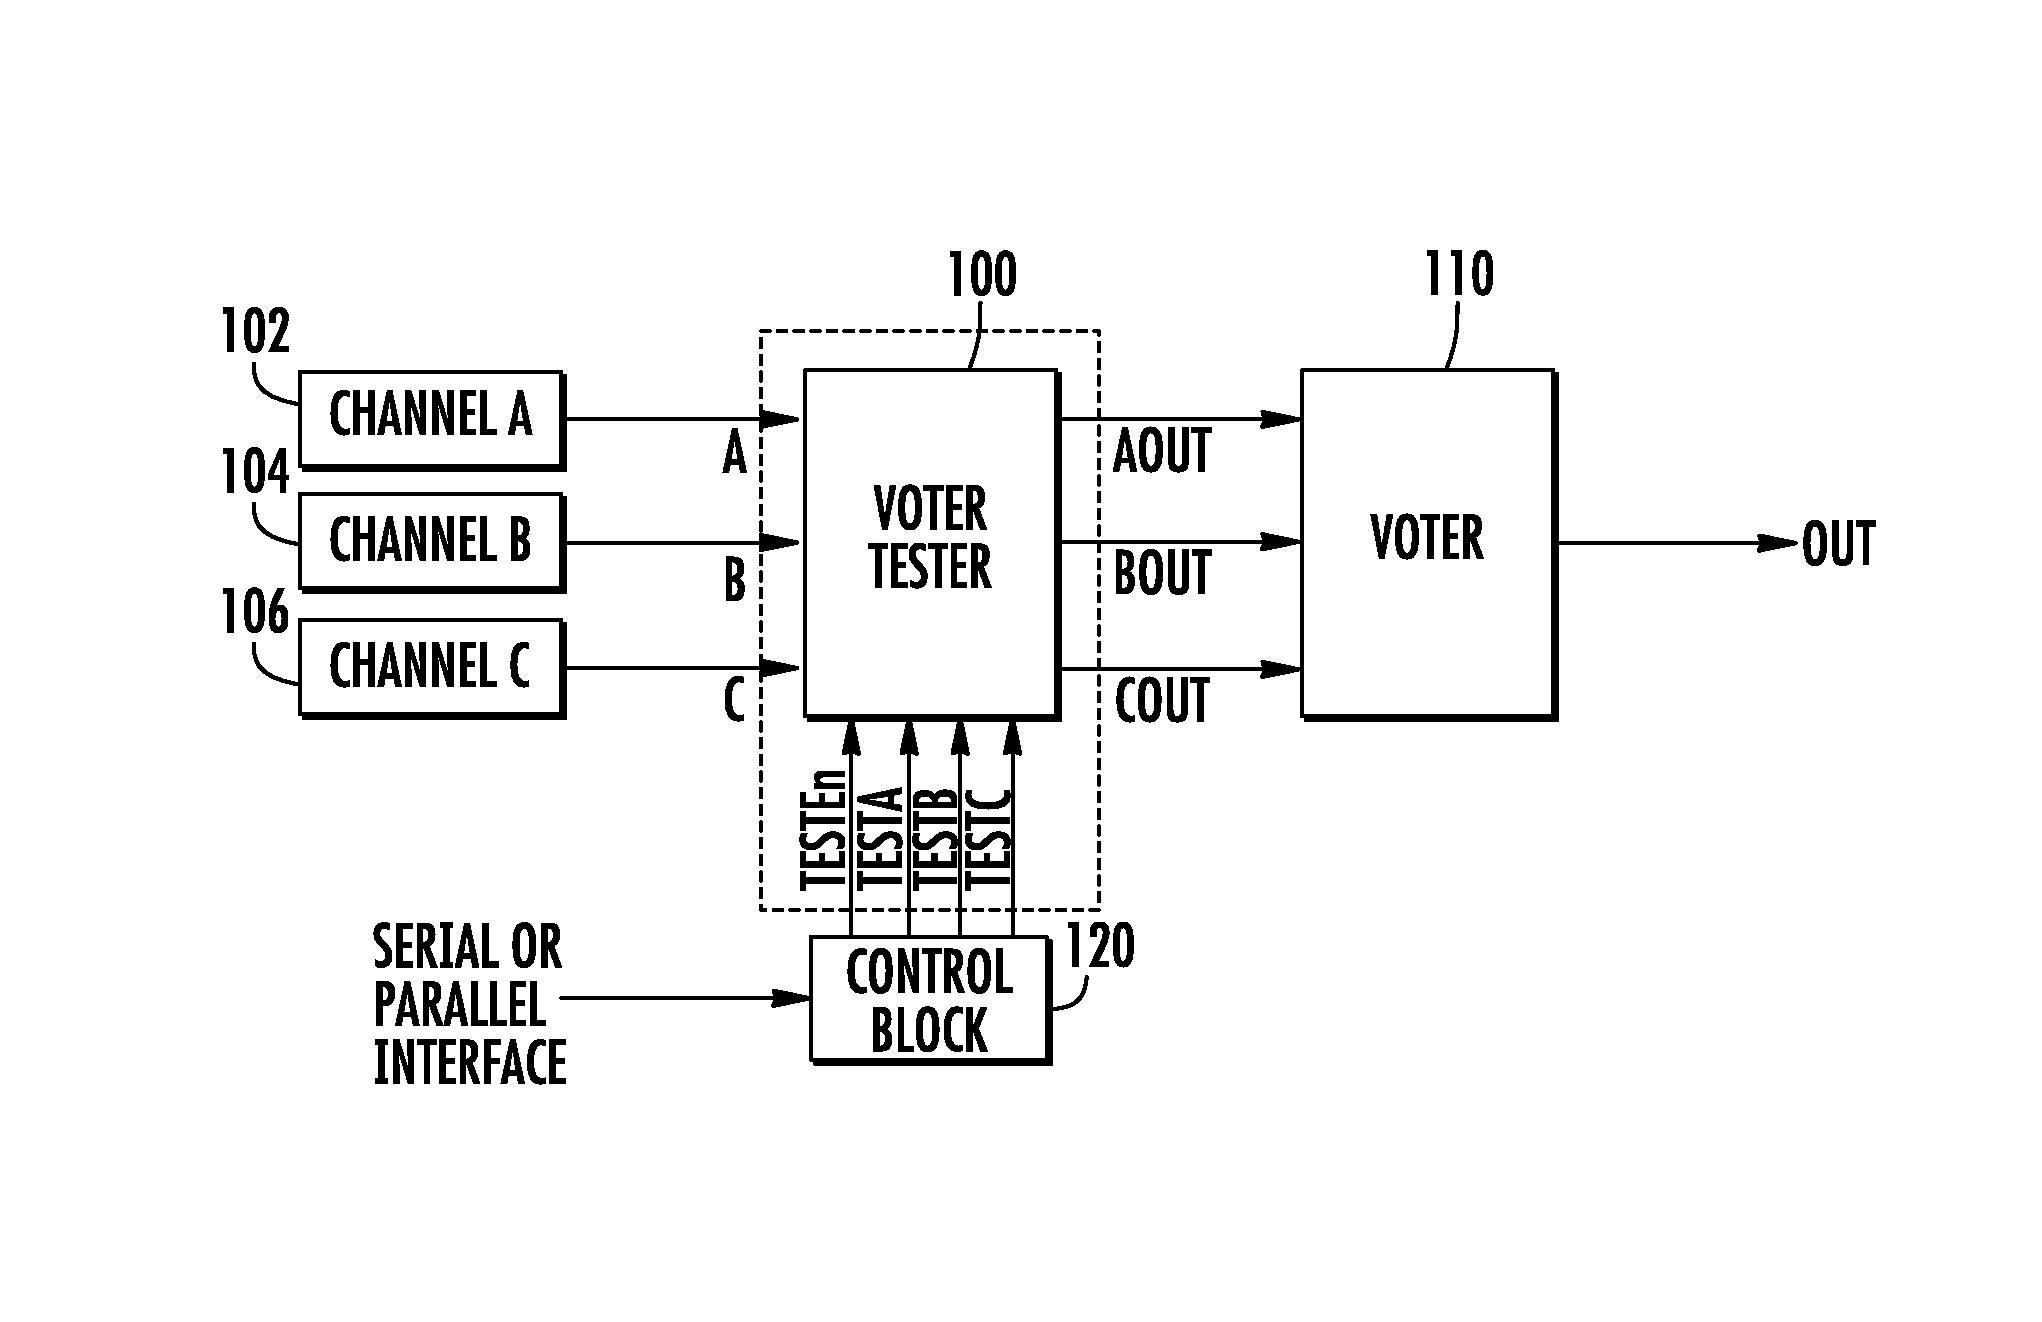 2 out of 3 logic diagram blueraritan info rh blueraritan info Process Logic Diagram Logic Flow Diagram